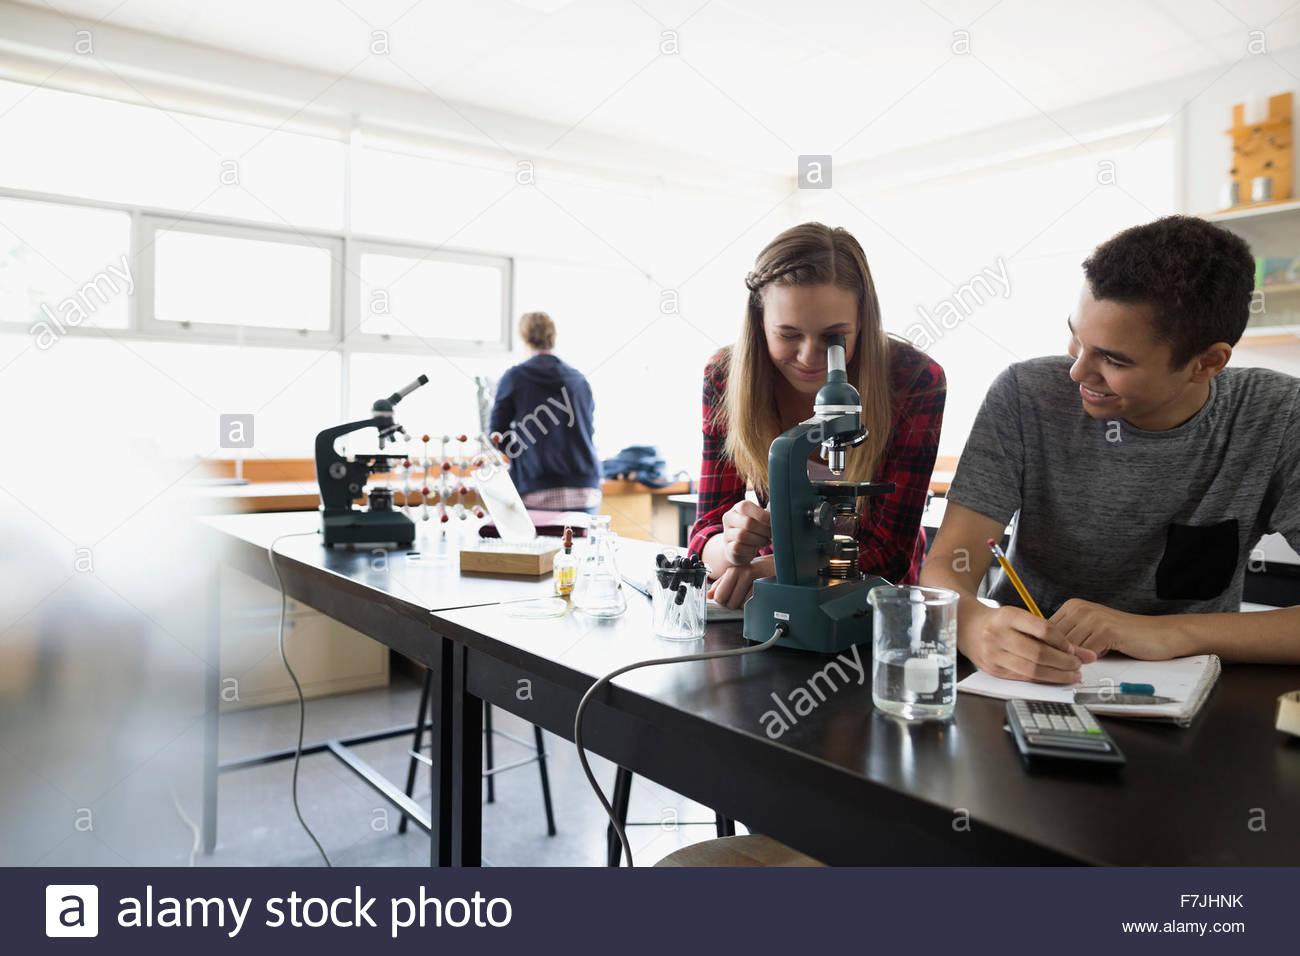 High school students using microscope science laboratory classroom - Stock Image